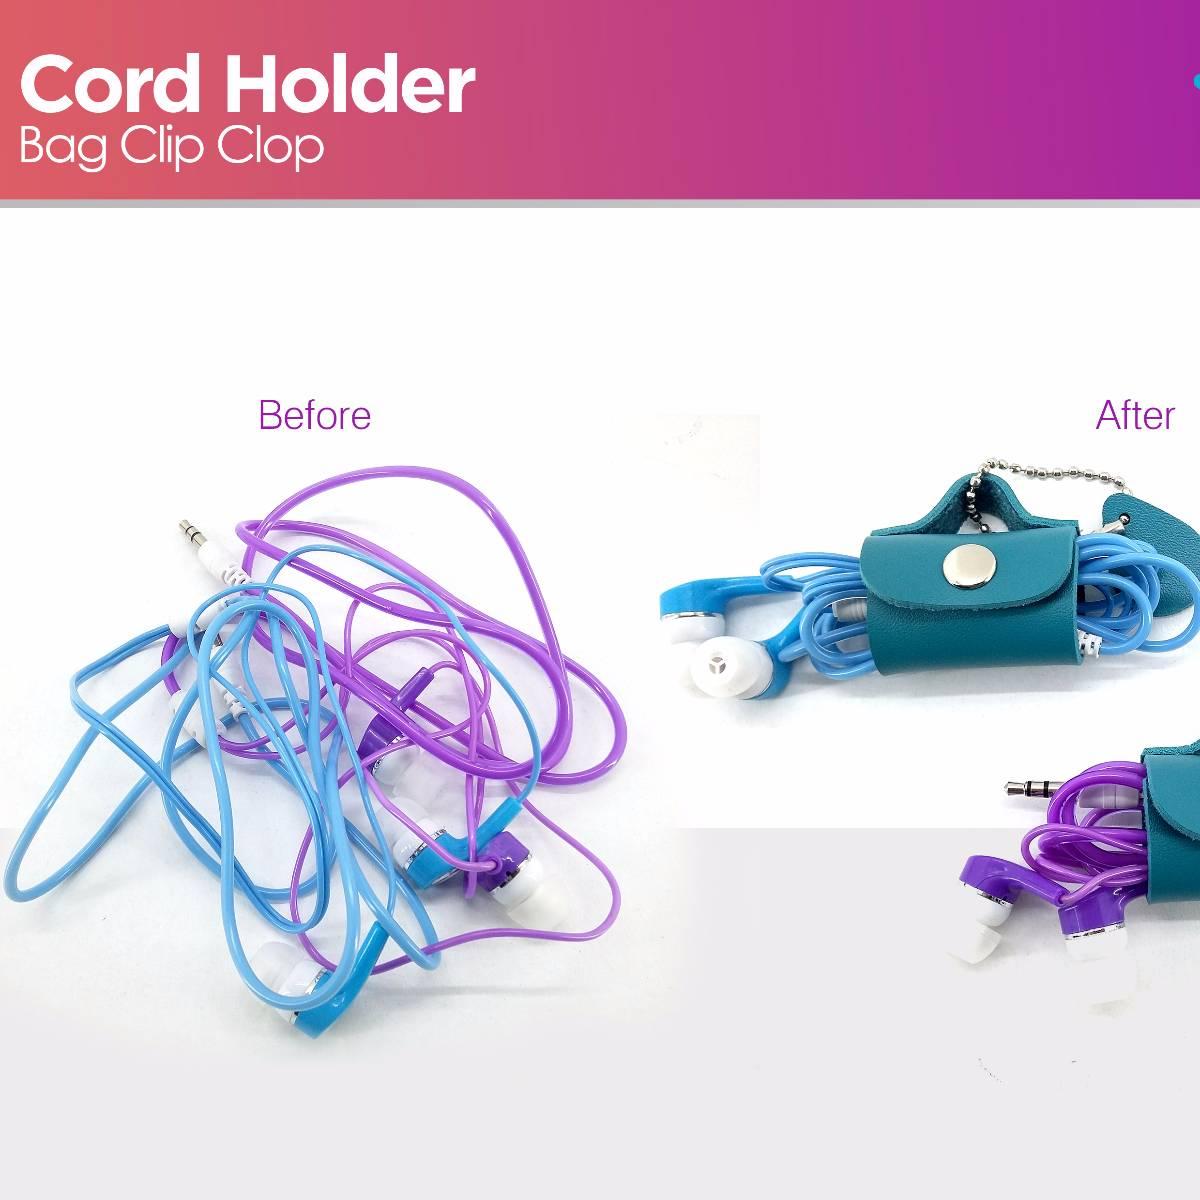 Cord Holder Bag1